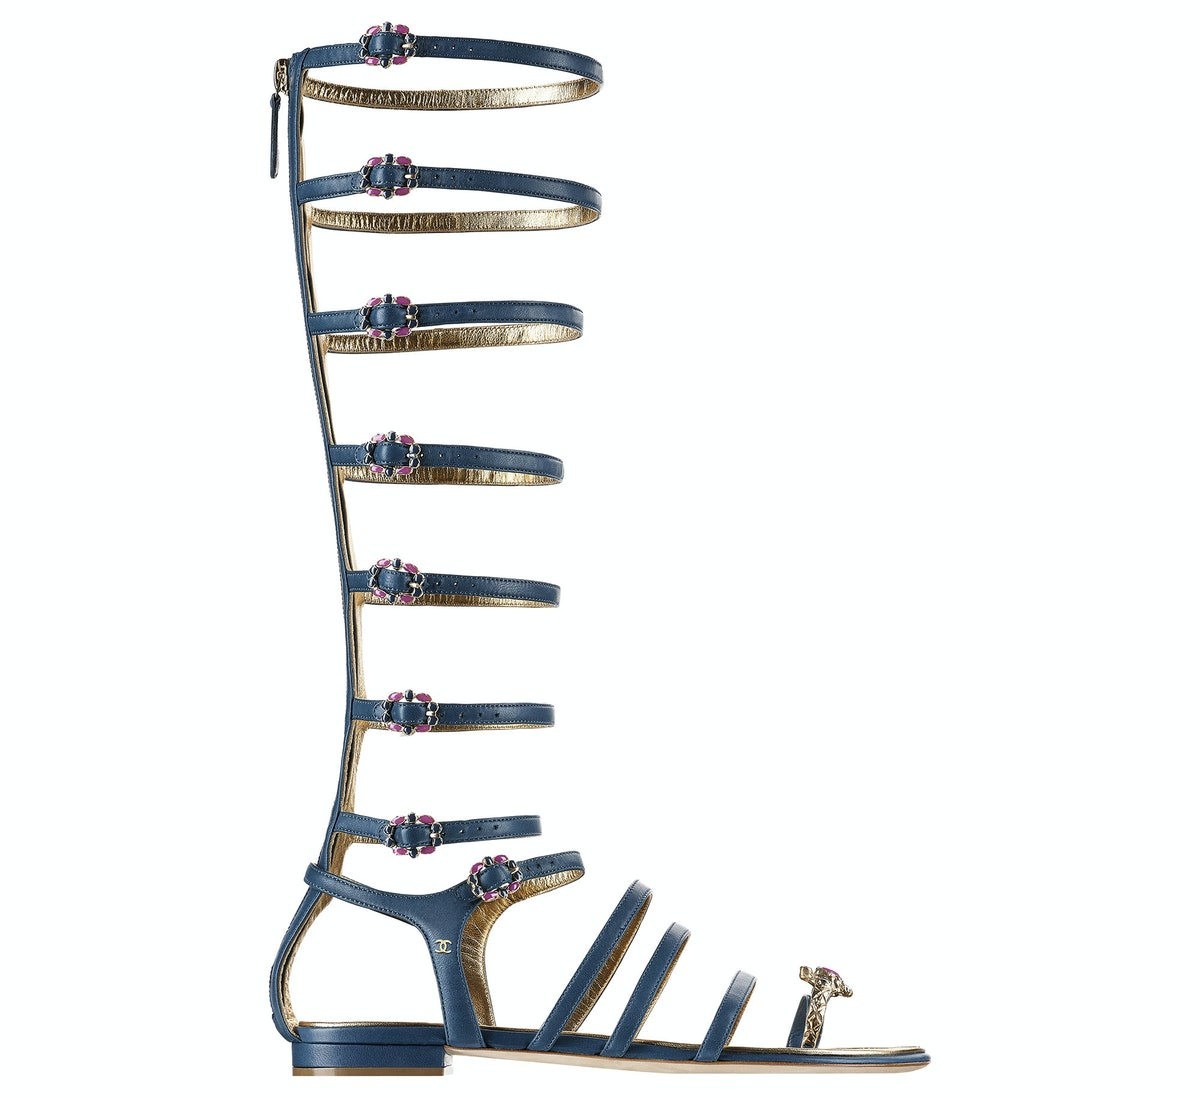 Chanel gladiator sandals